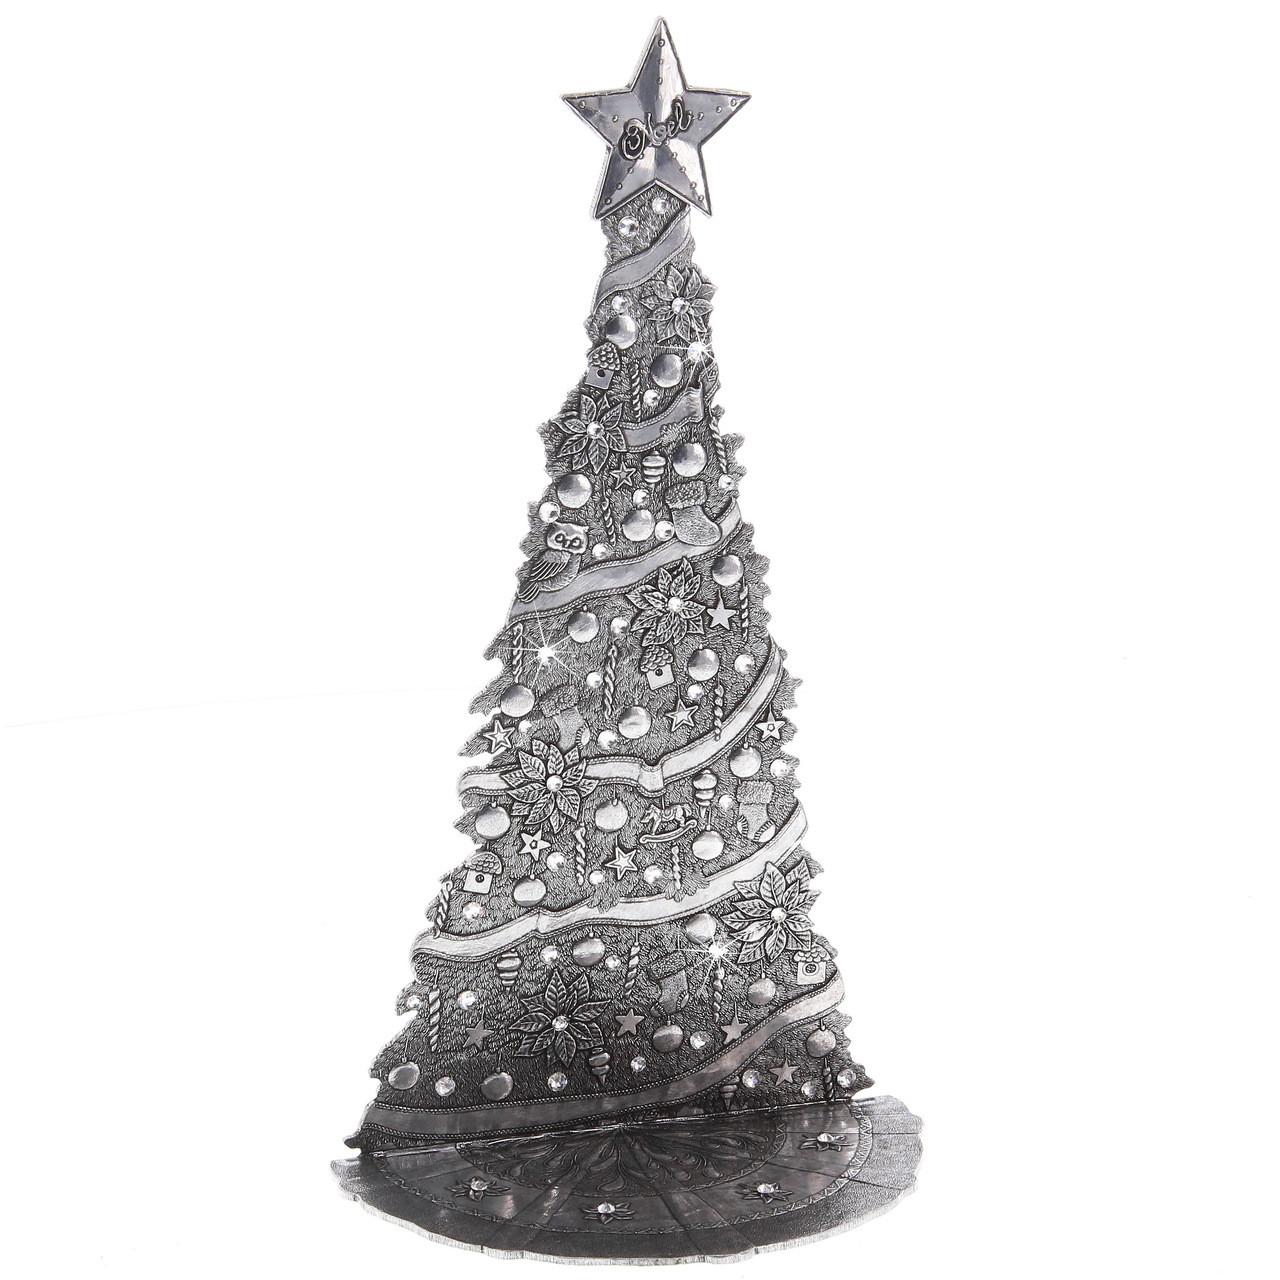 Village Christmas Tree Stand.The Magic Christmas Village Tree Large Aluminum